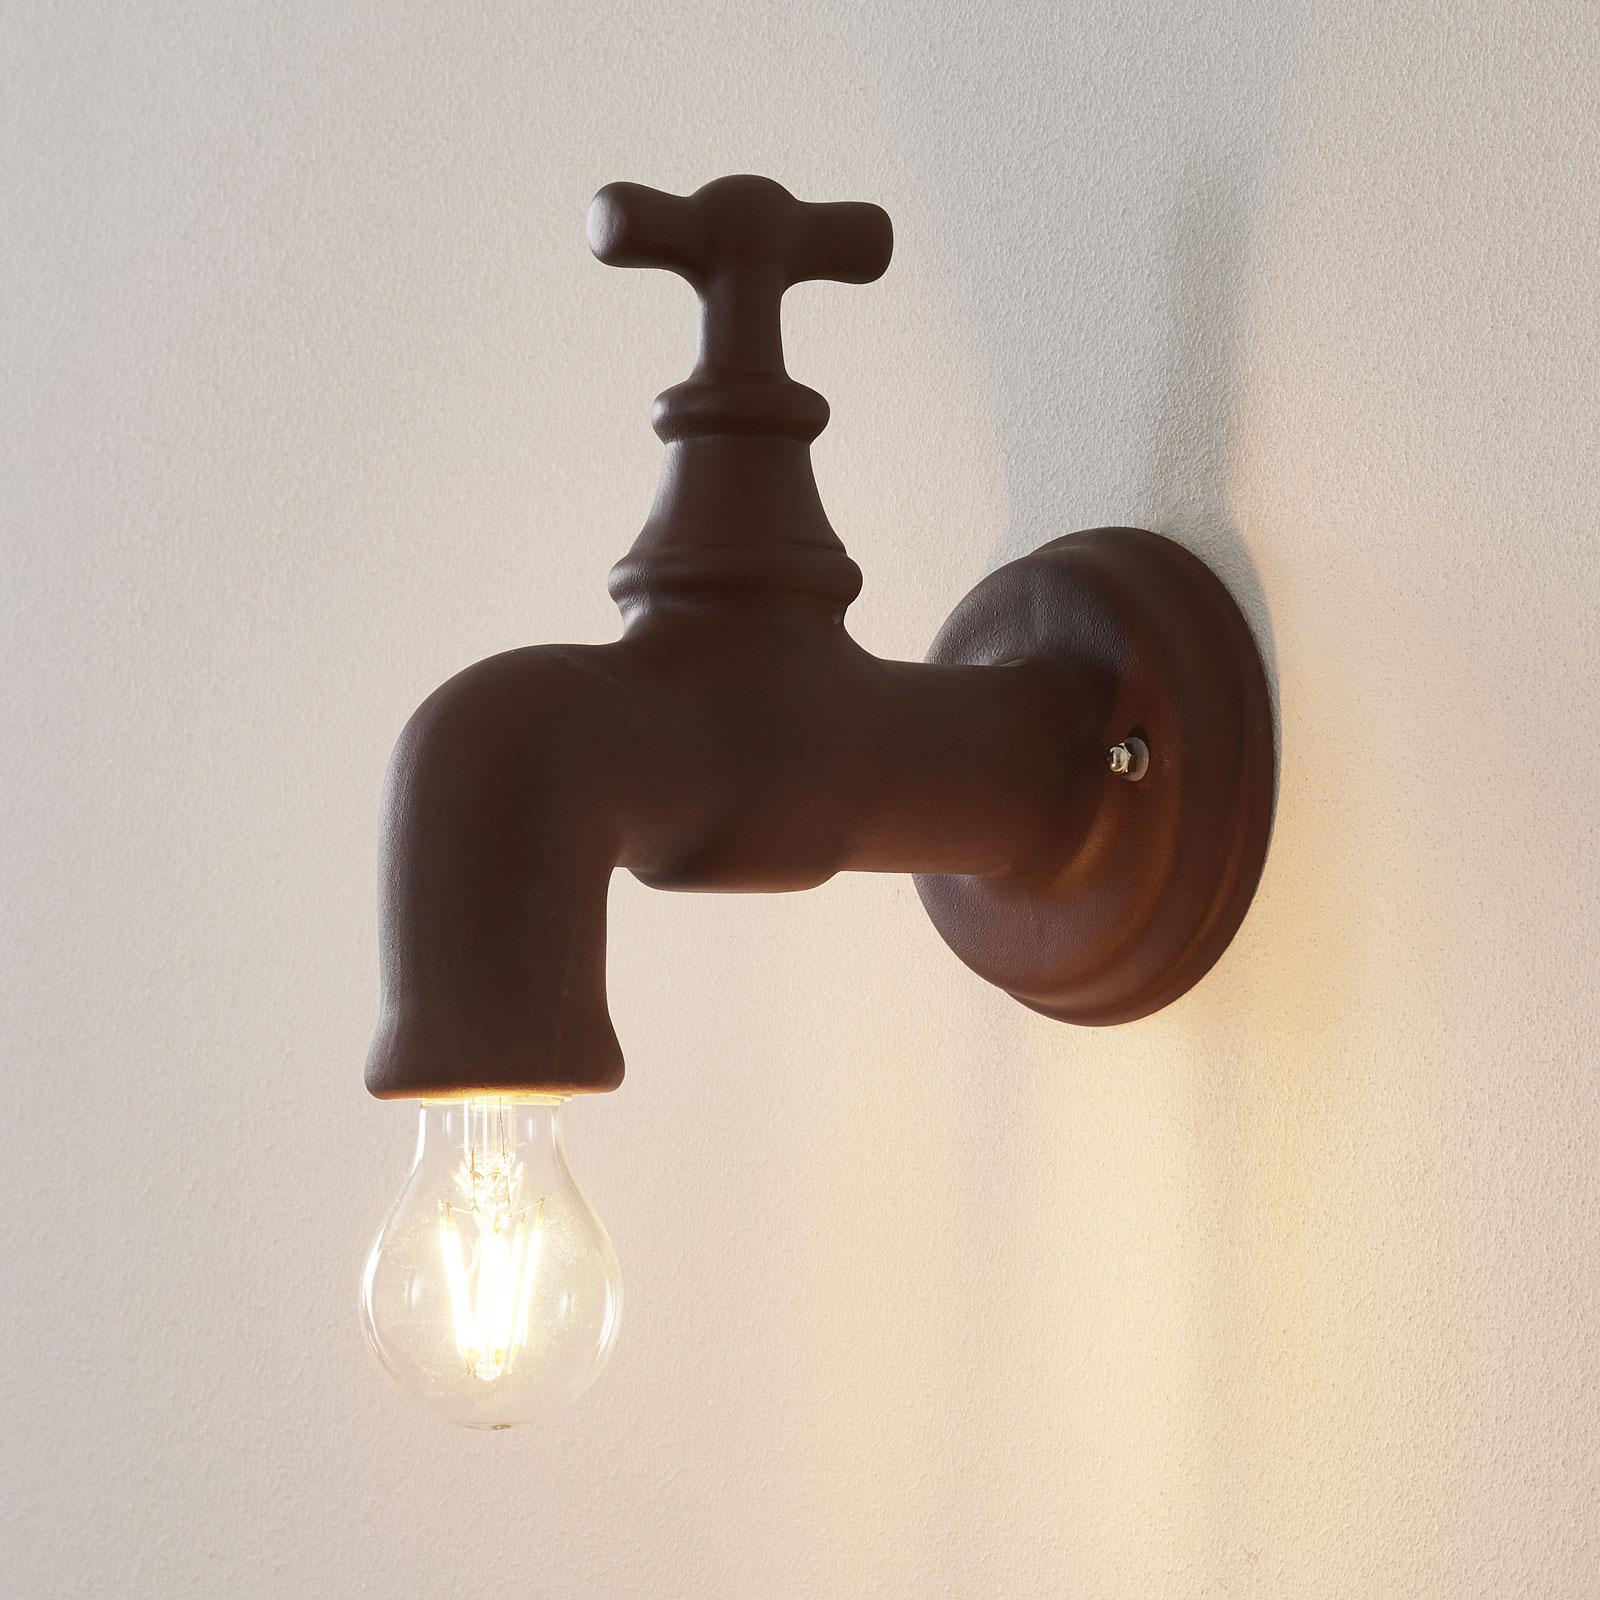 Keramiek-wandlamp A188, bruin mat